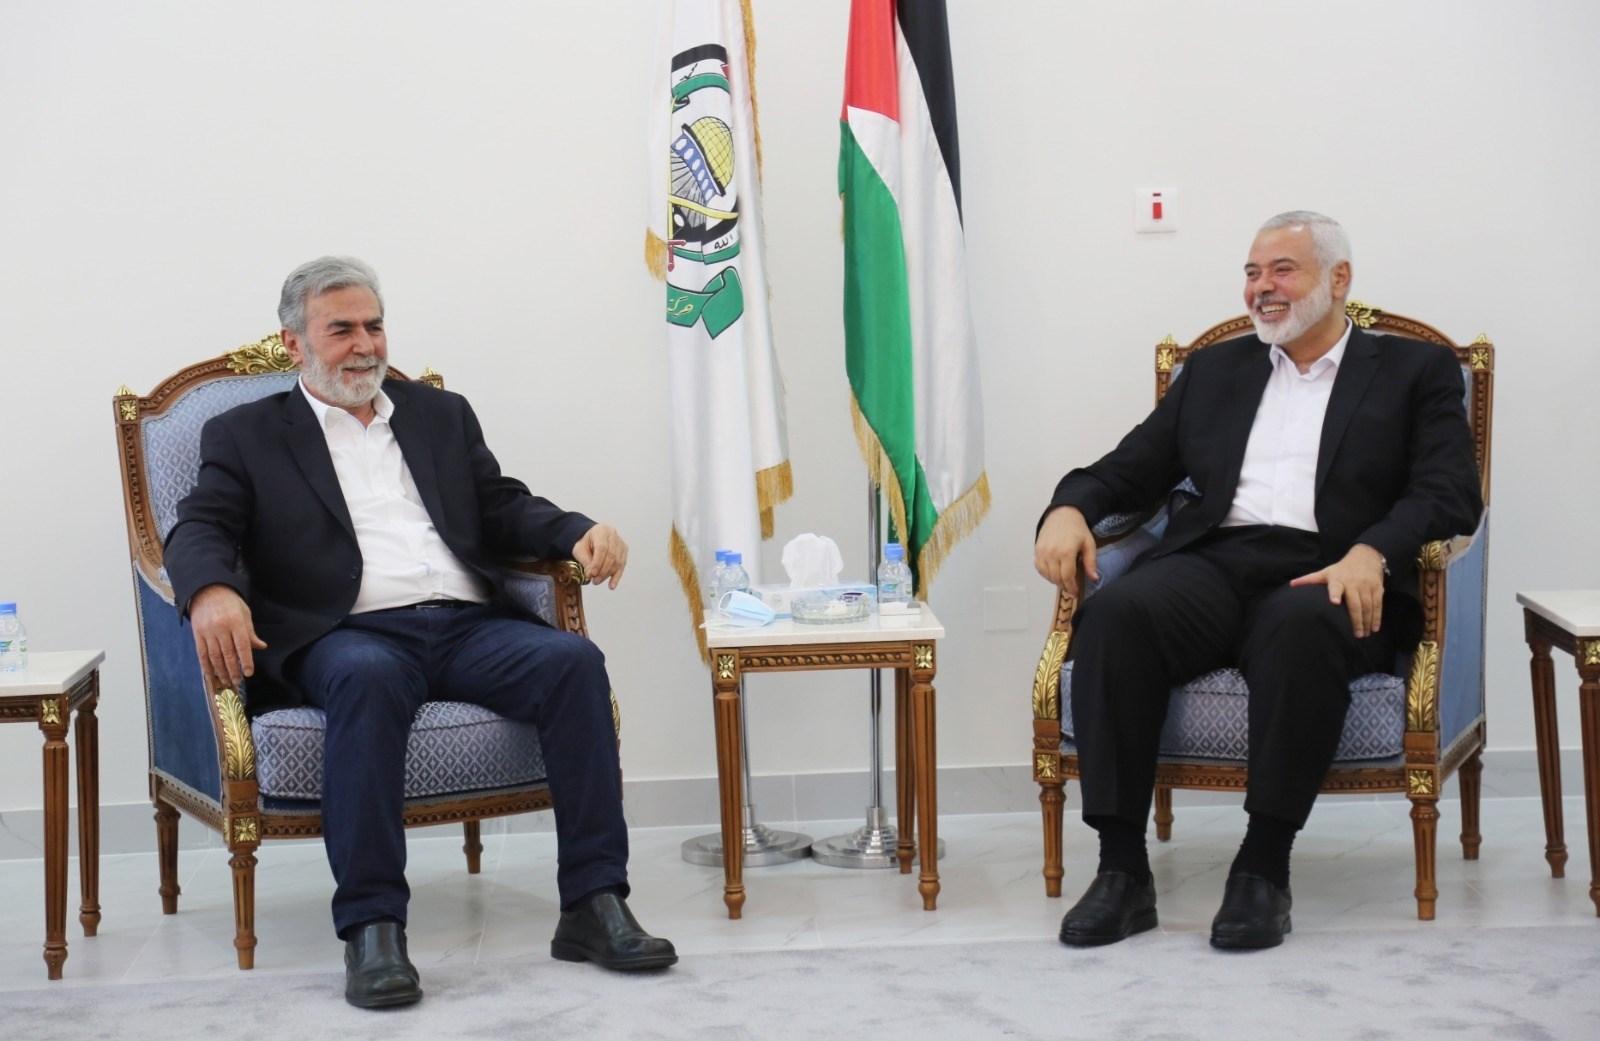 Hamas political bureau leader Ismail Haniyeh and PIJ Security-General Ziyad al-Nakhalah